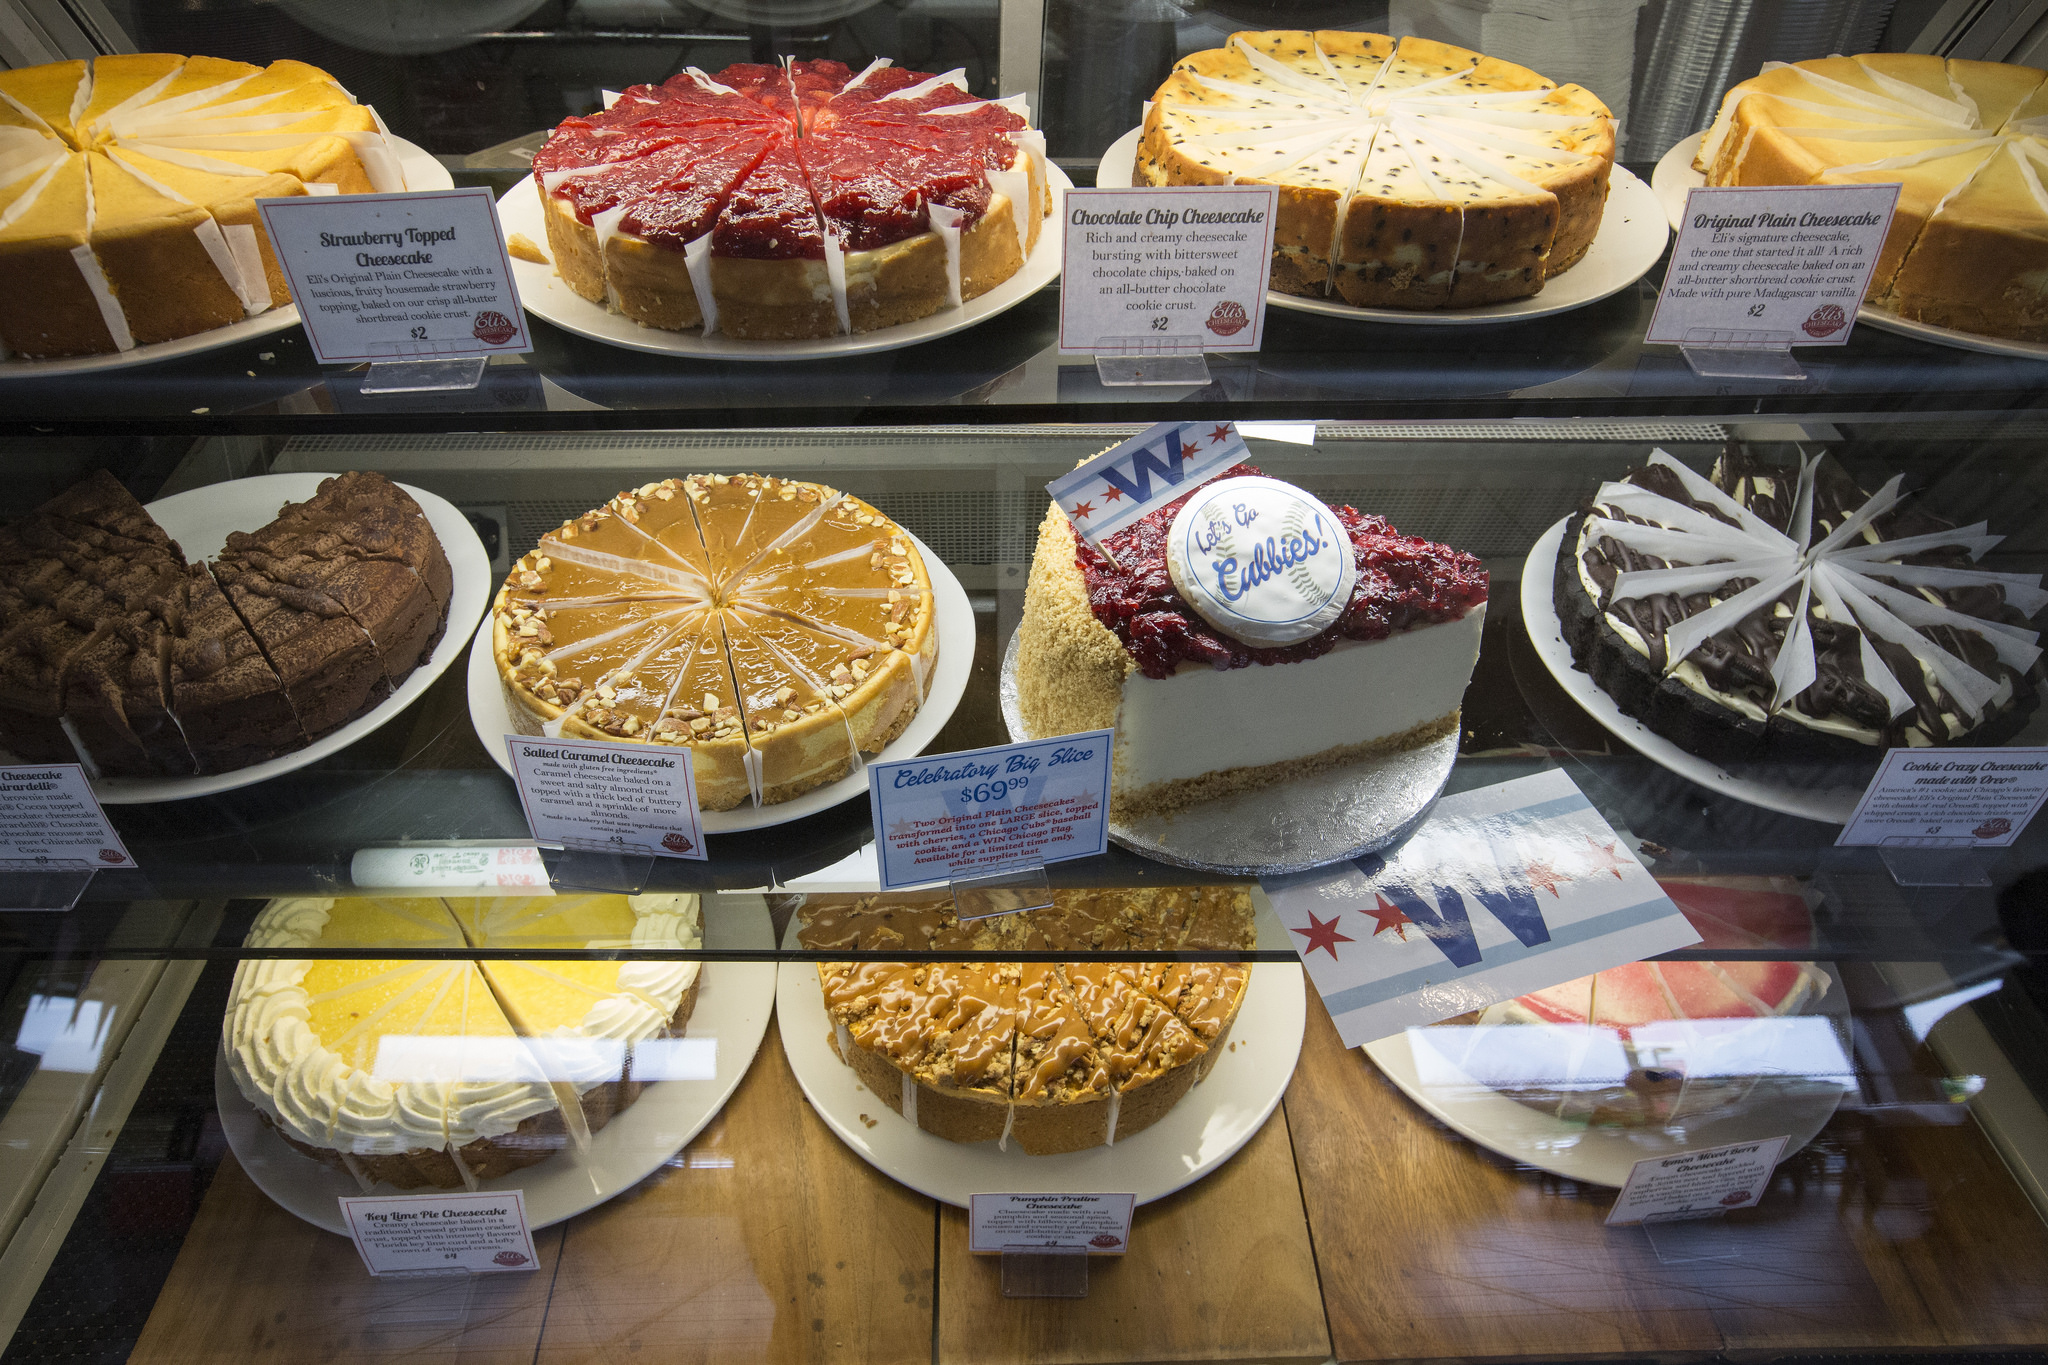 Eli's many cheesecake varieties